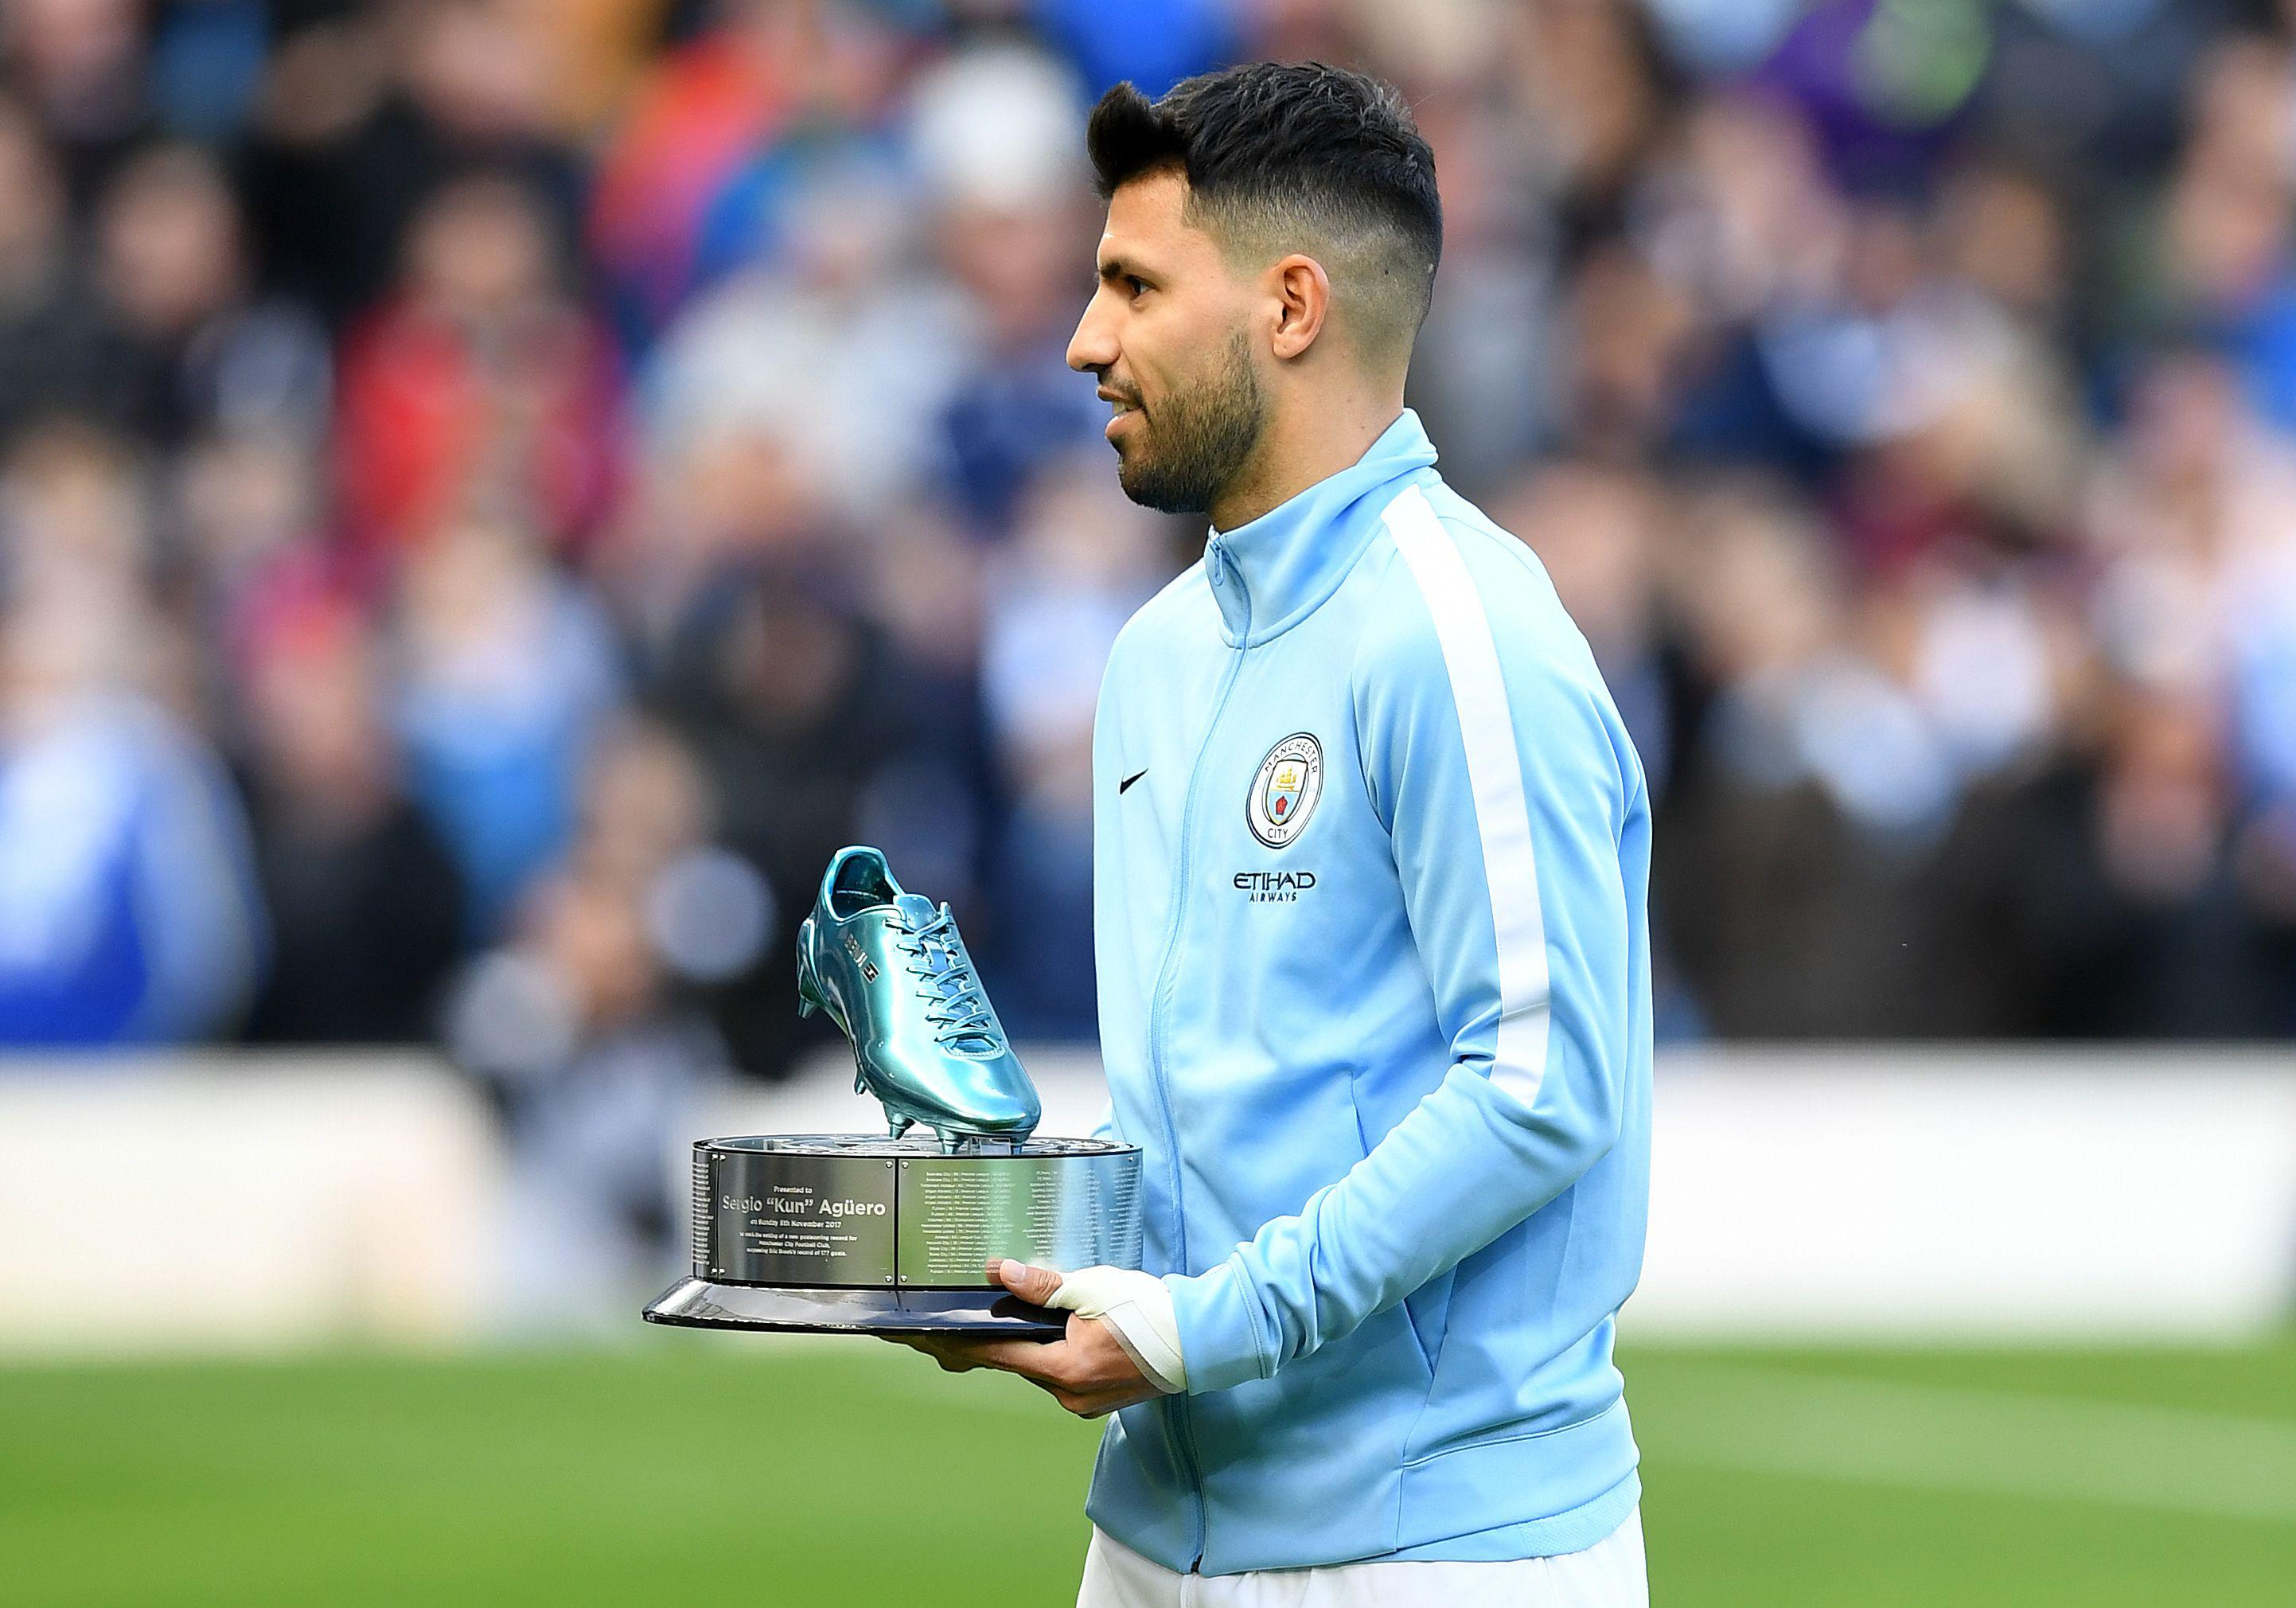 Aguero is City's all-time leading goalscorer